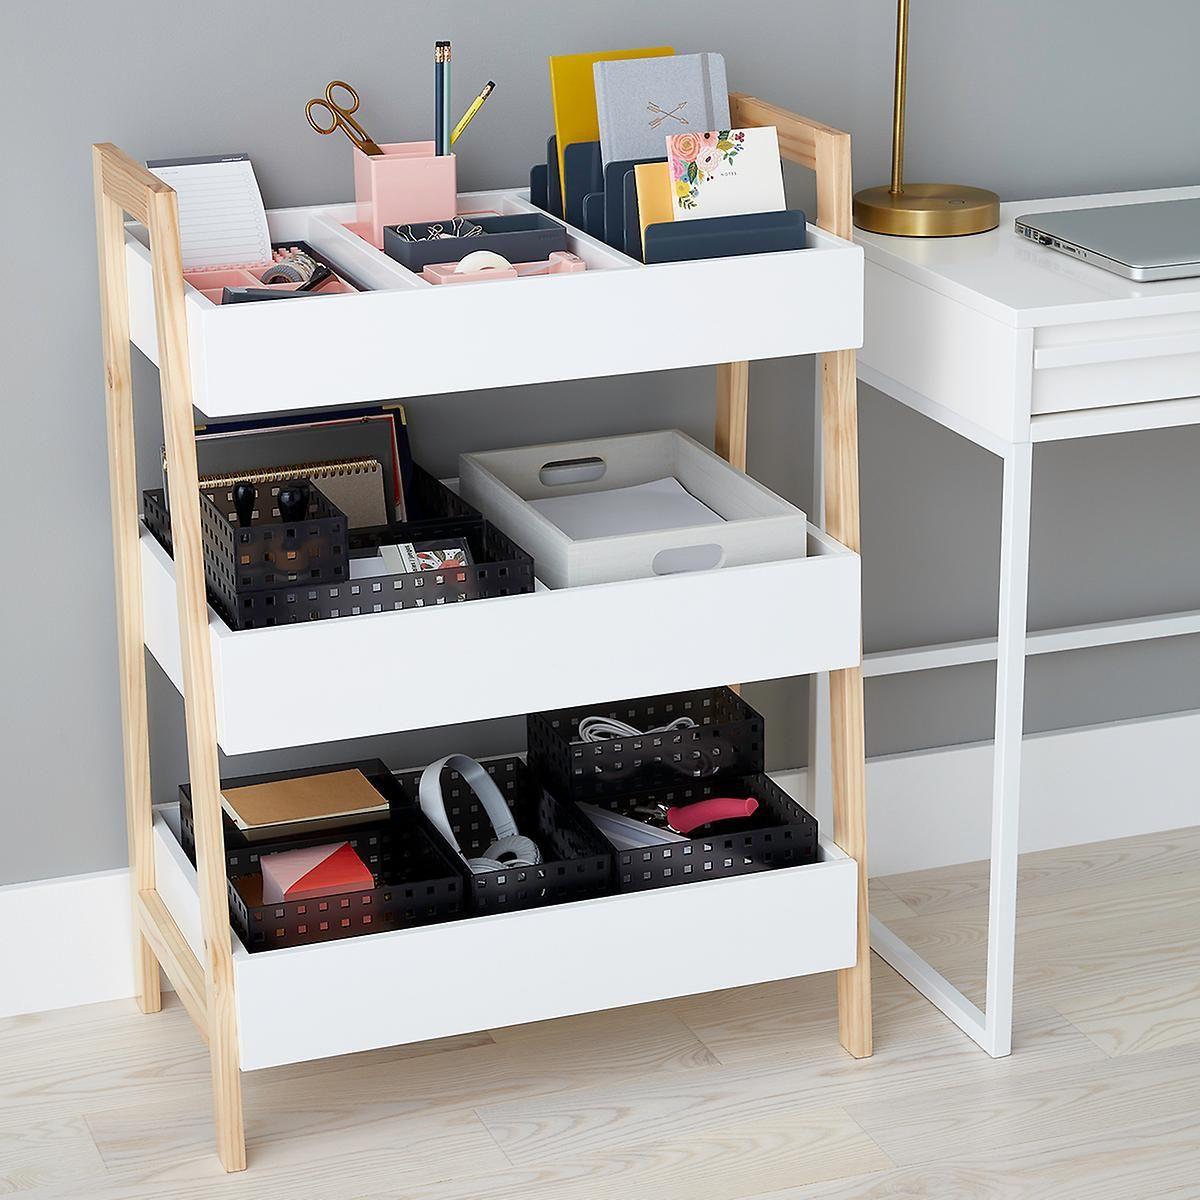 White Multi Purpose 3 Tier Shelf Storage Design Shelves Office